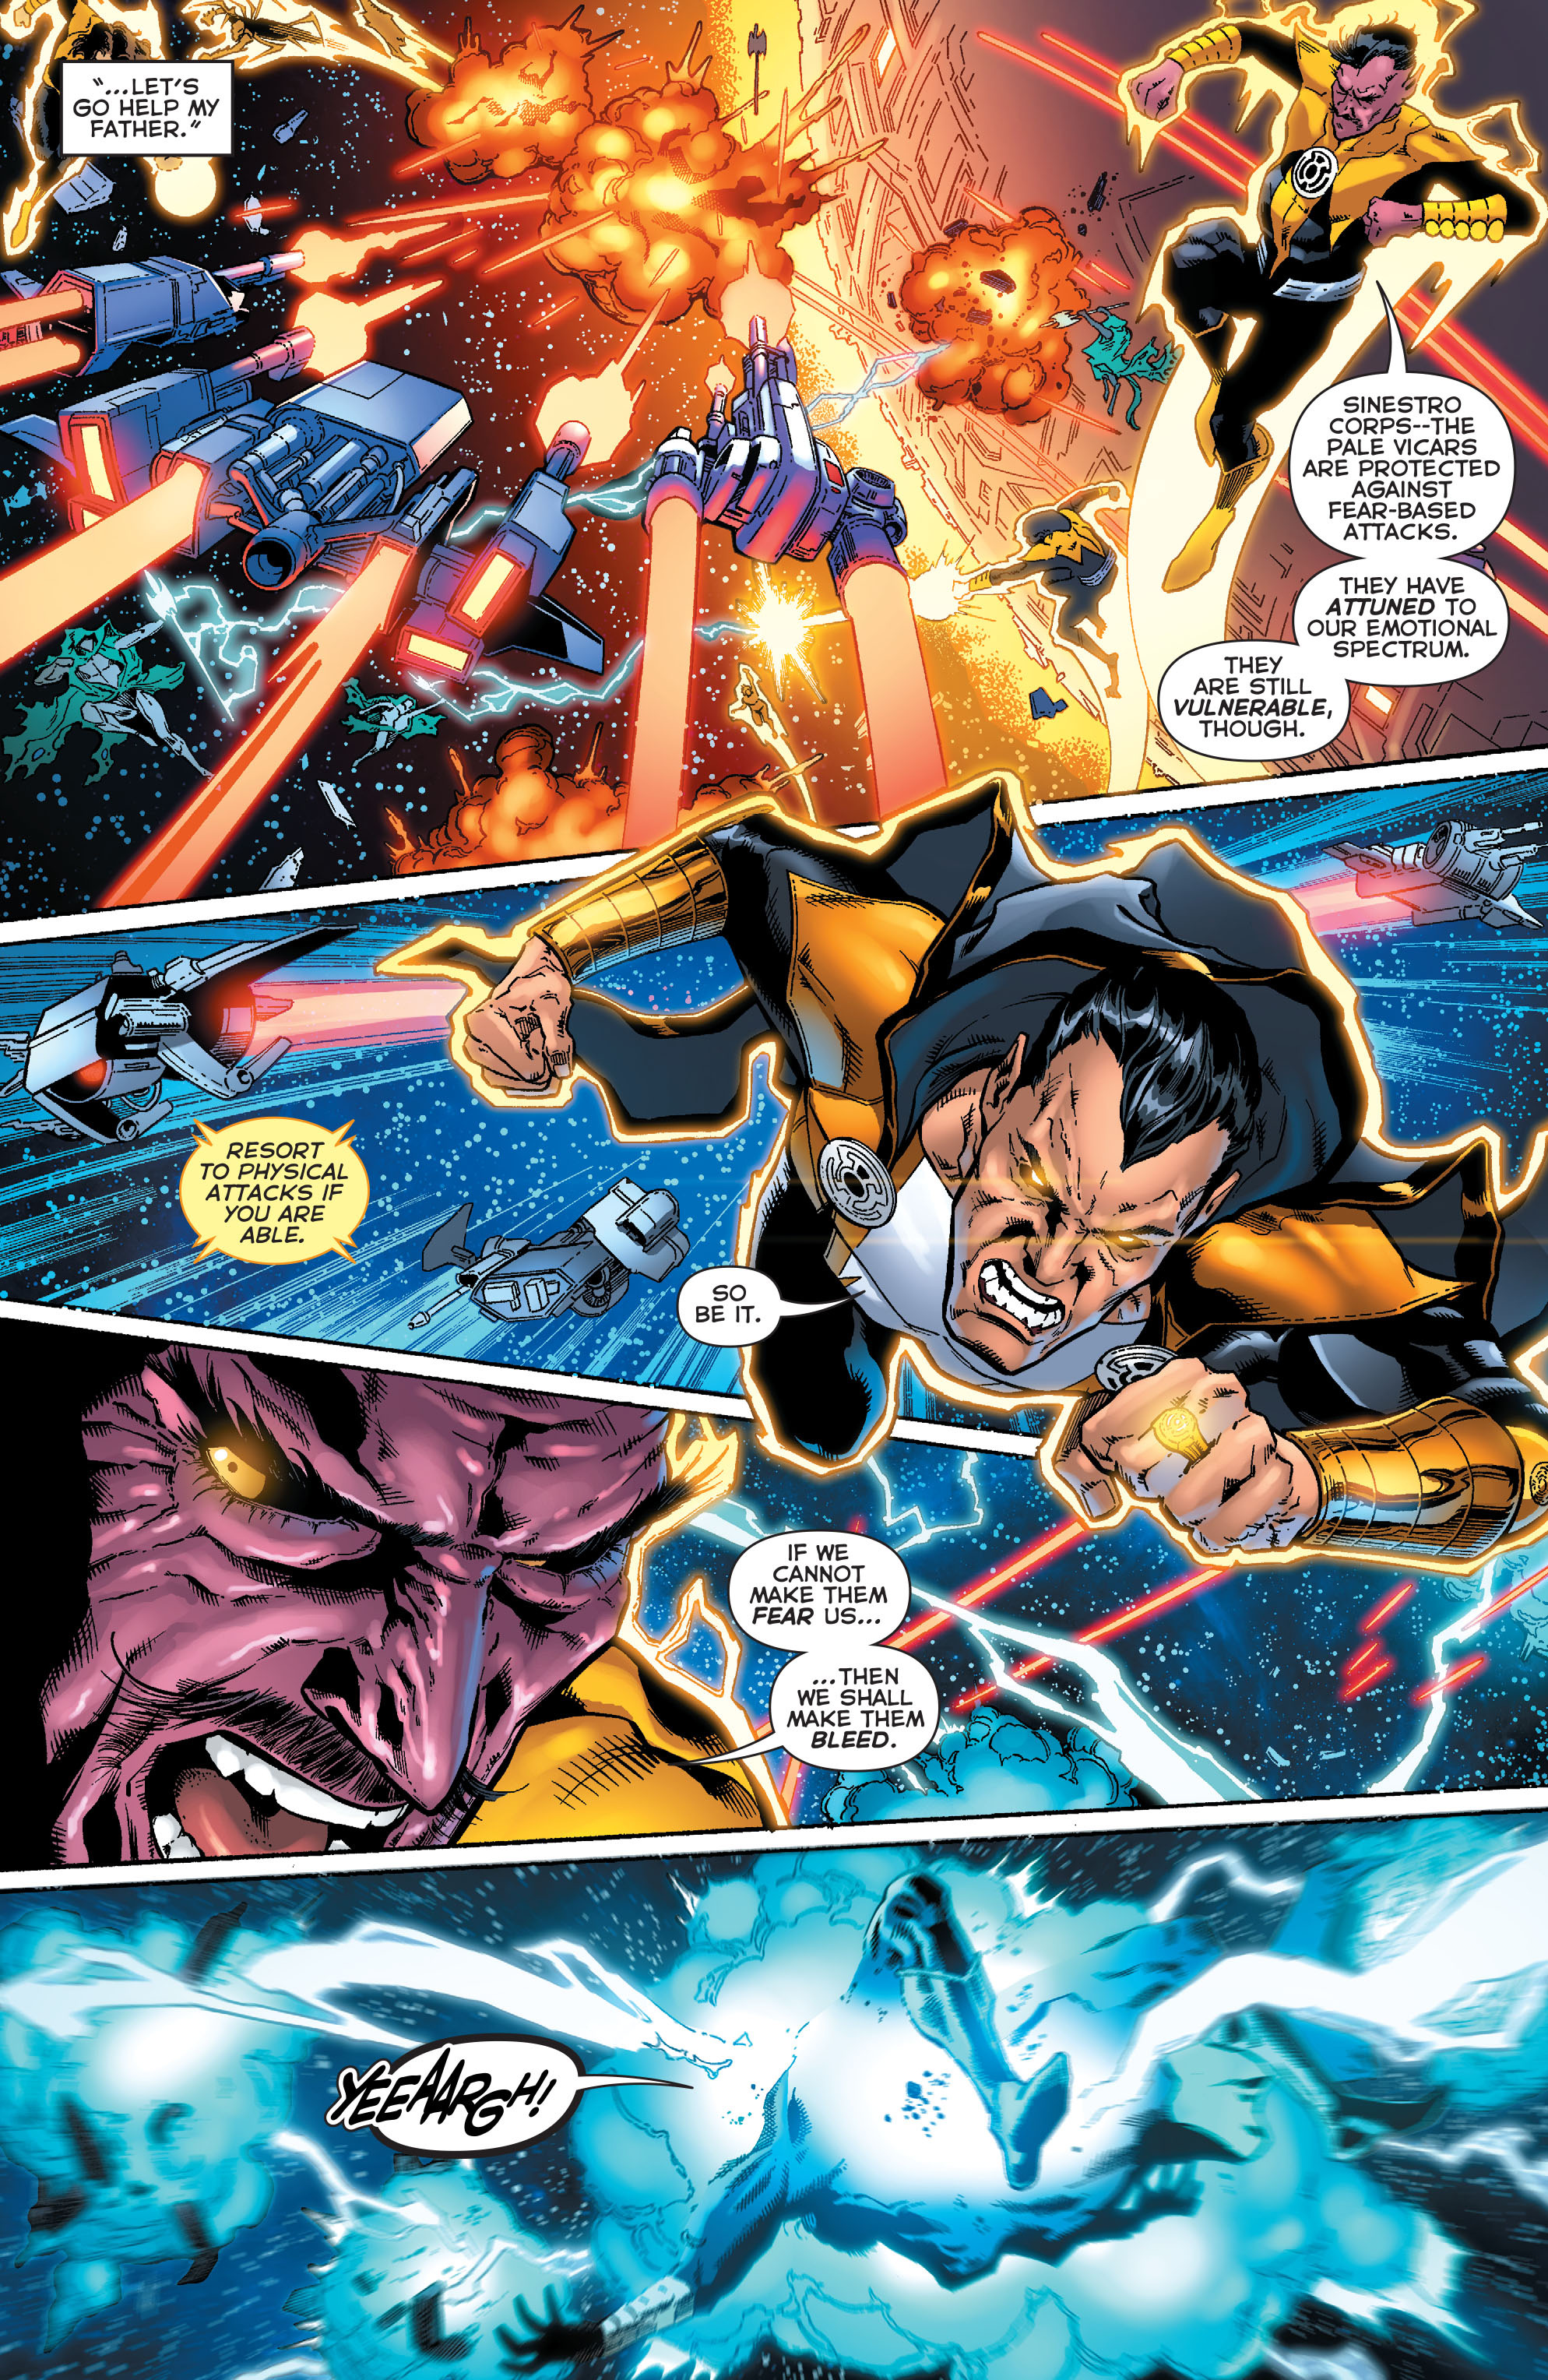 Read online Sinestro comic -  Issue #18 - 12